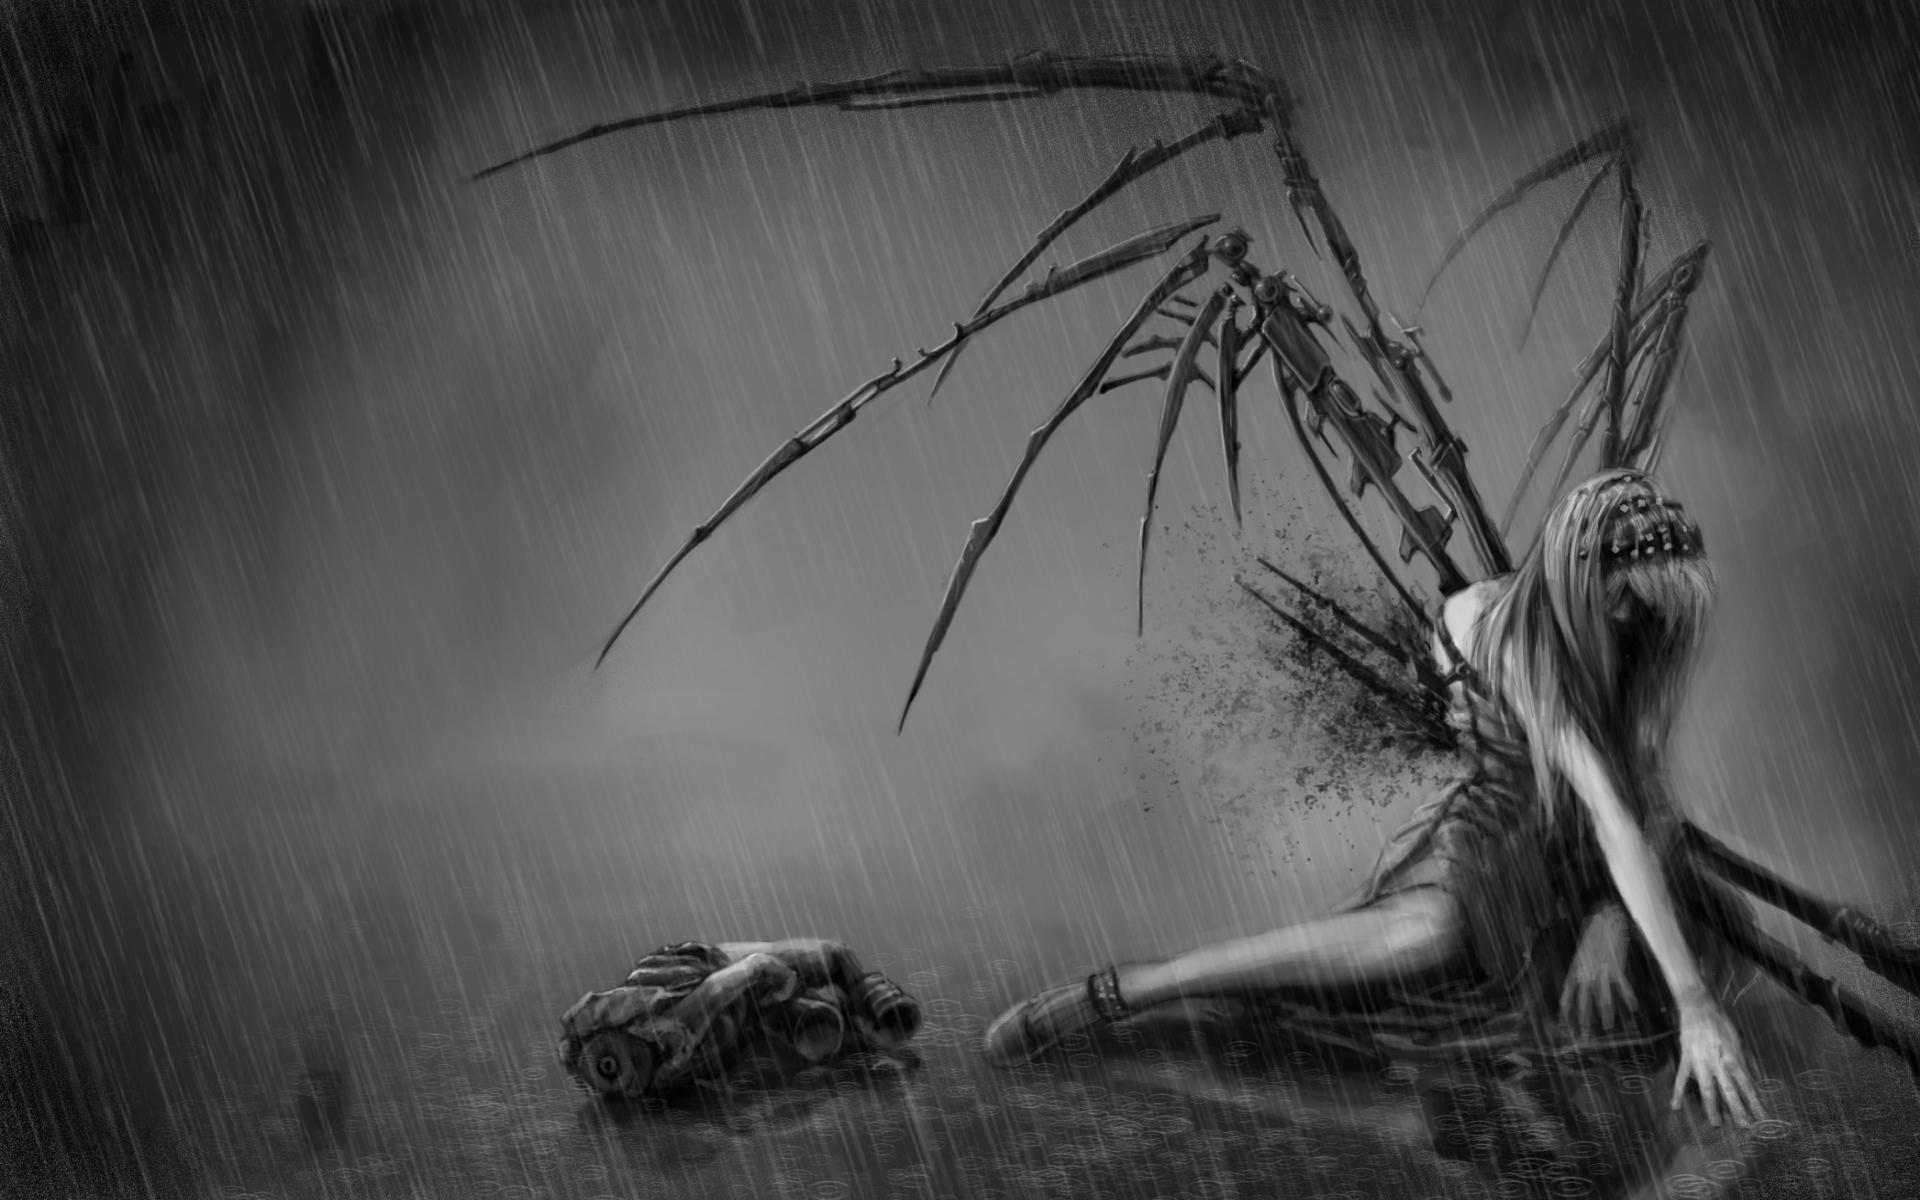 la sagne deviantart com anime fantasy dark horror evil fallen angels 1920x1200